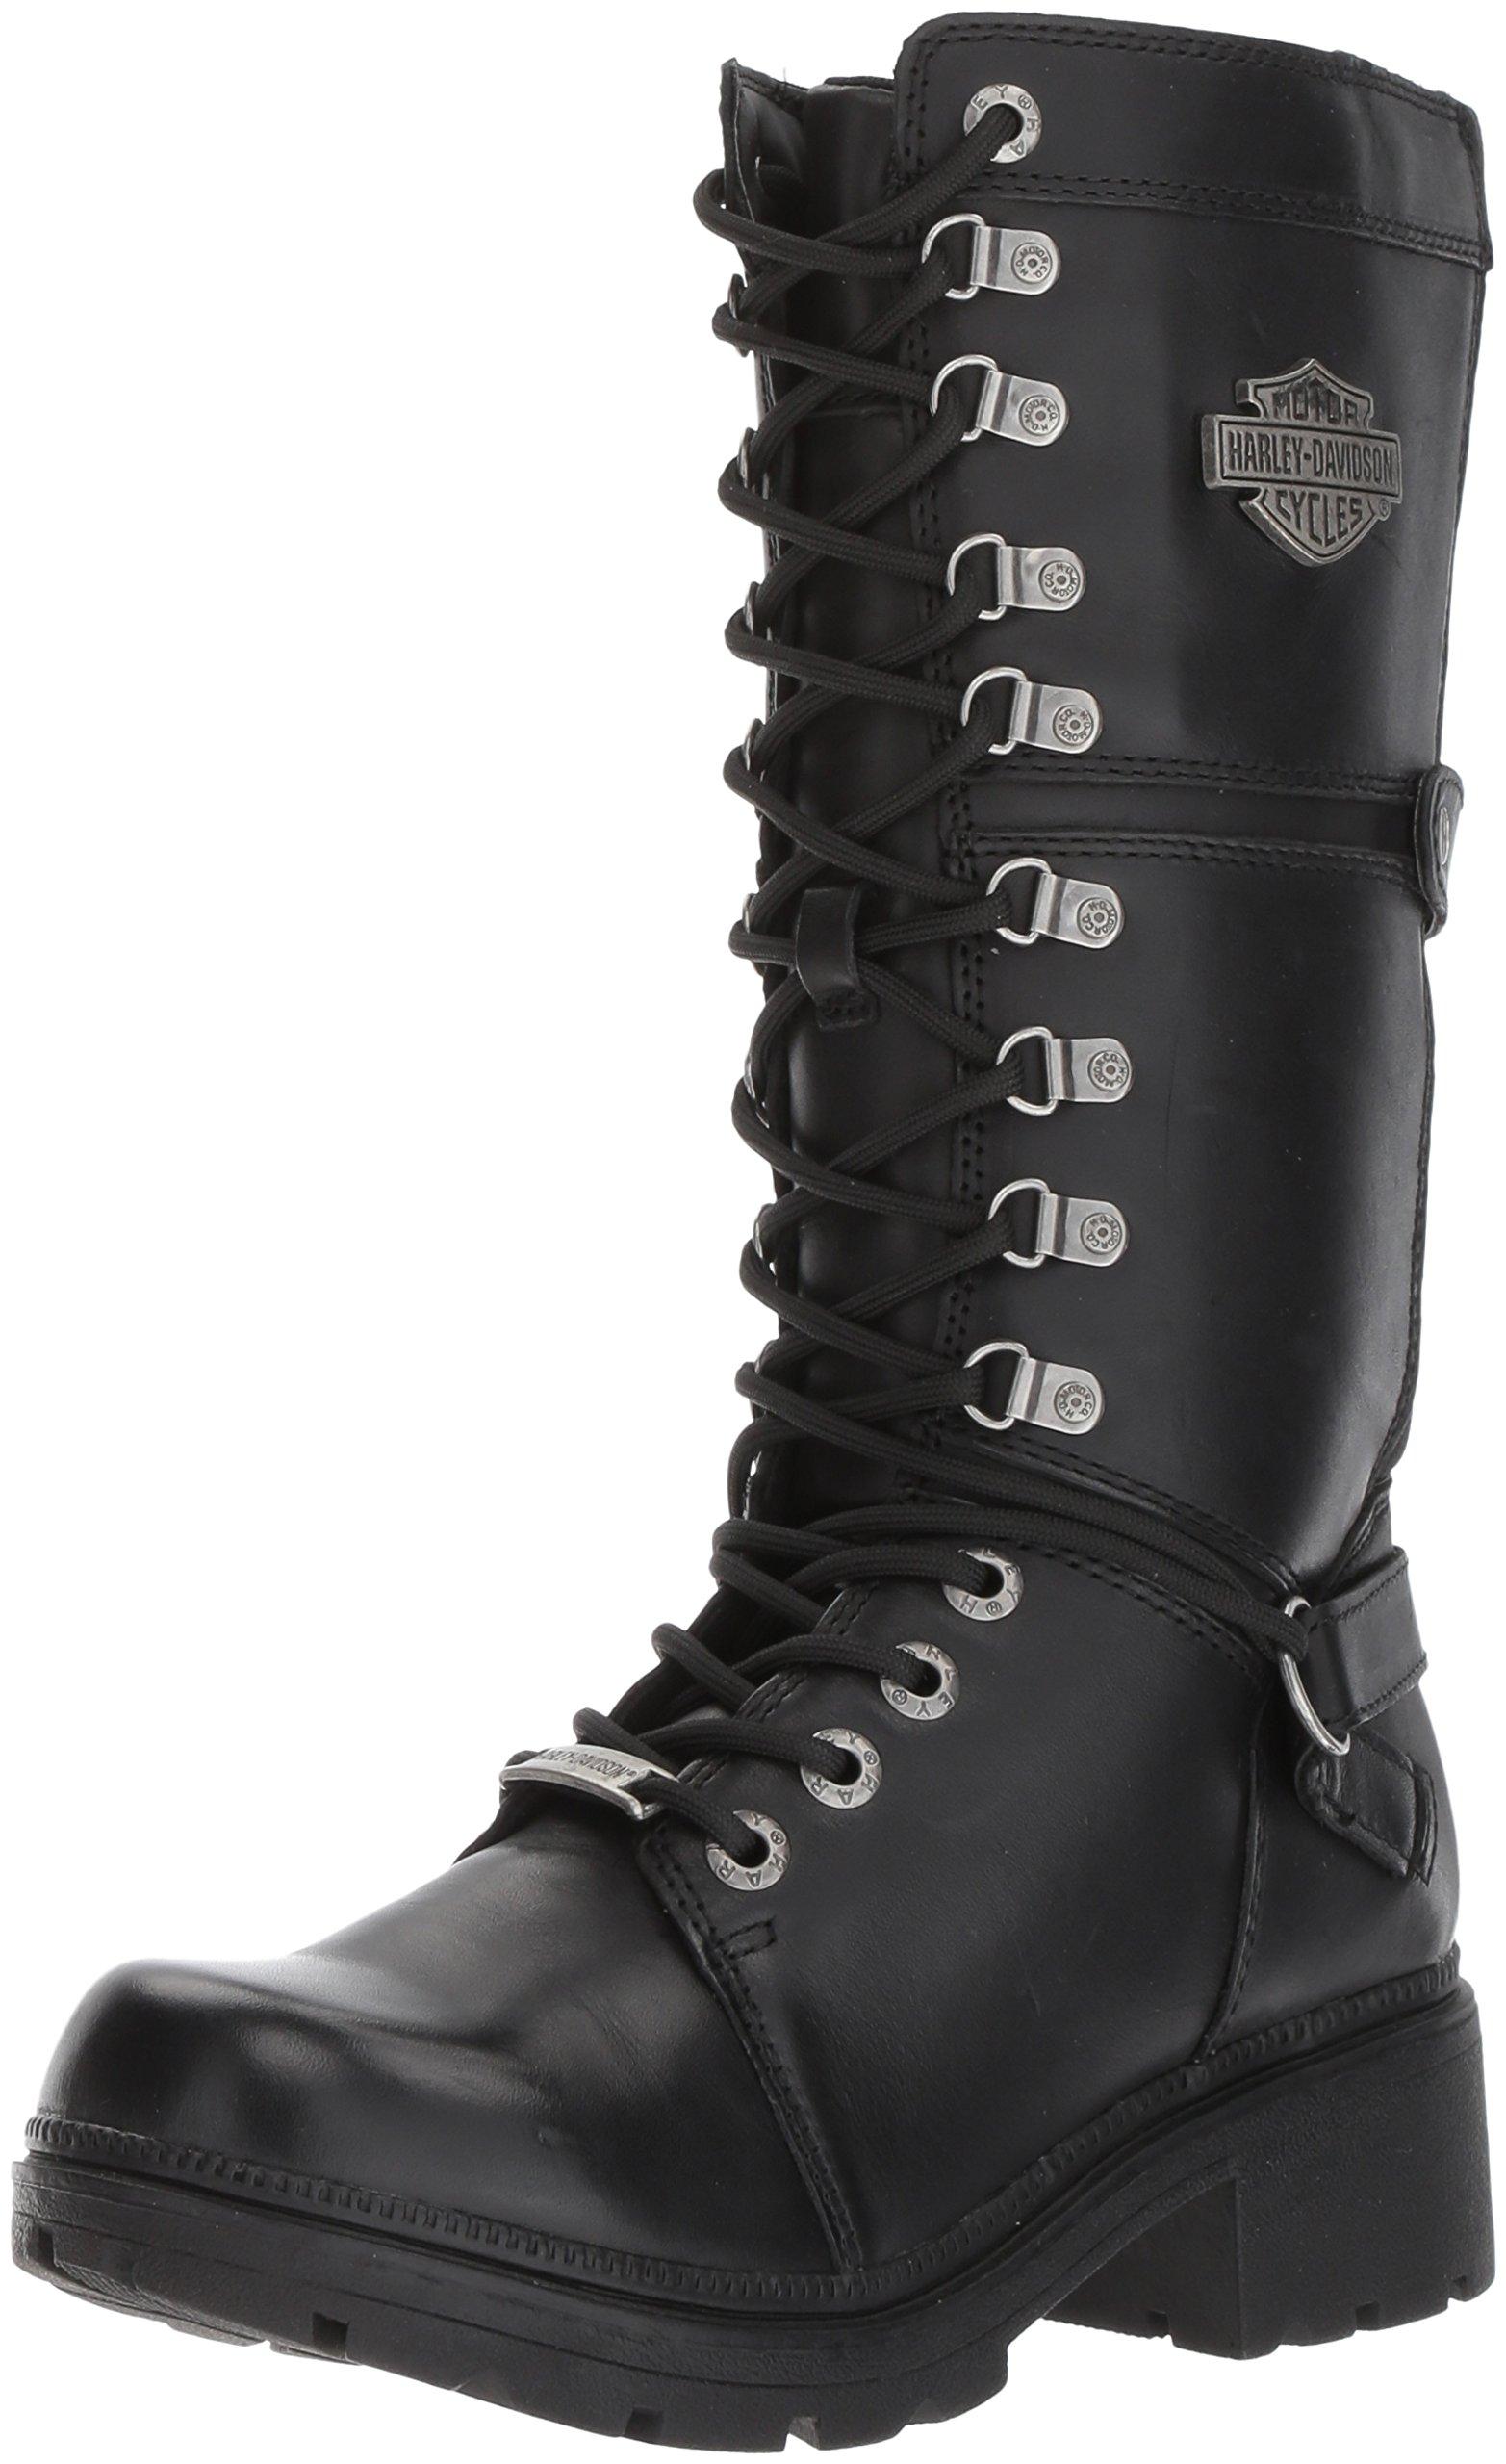 Harley-Davidson Women's Harland Work Boot, Black, 8 M US